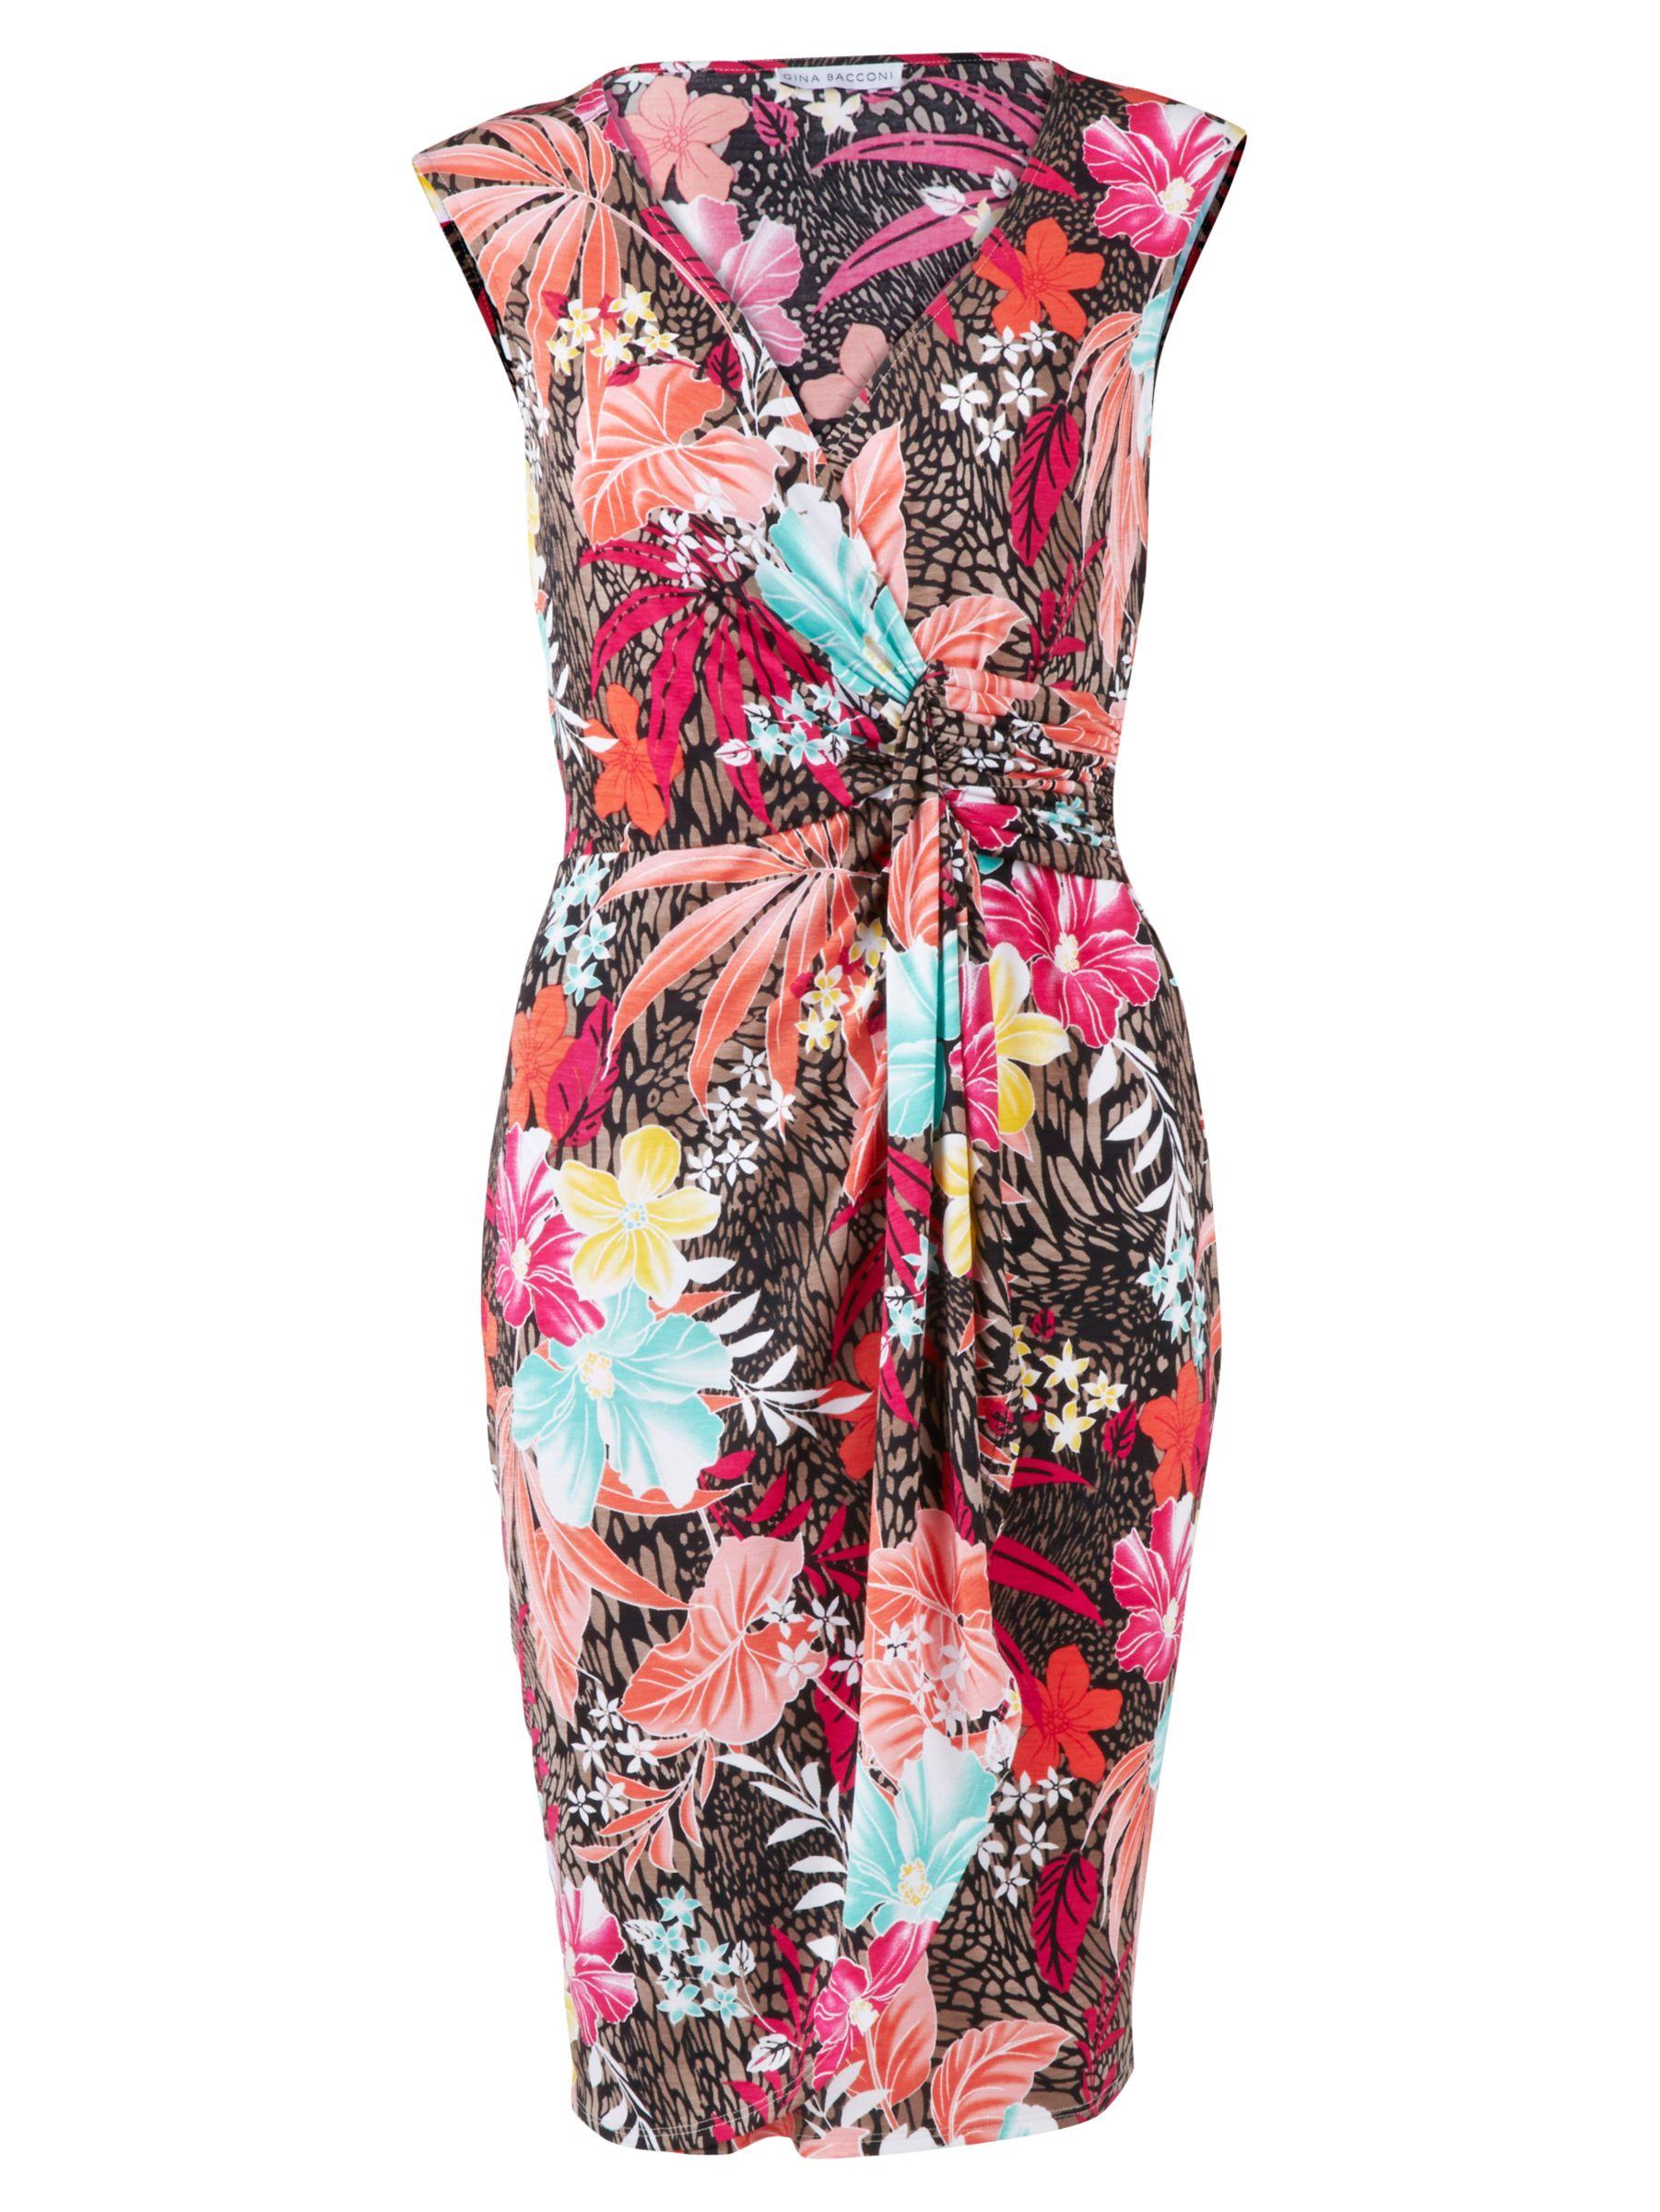 gina bacconi tropical print jersey dress fuchsia, gina, bacconi, tropical, print, jersey, dress, fuchsia, gina bacconi, 8 10 22 14 20 12 16 18, women, plus size, womens dresses, 1869847